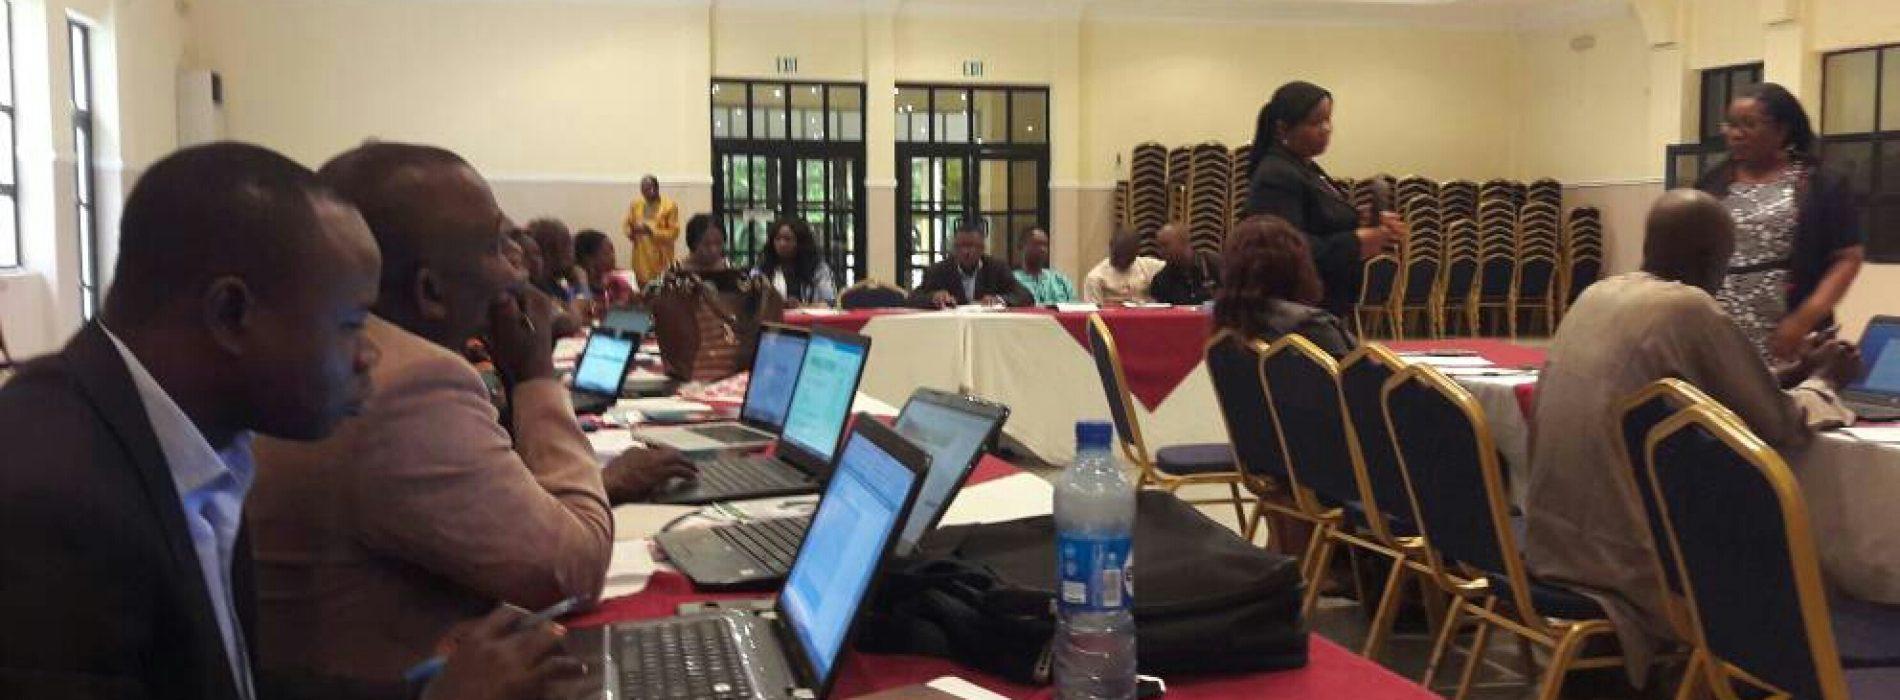 1.7 Nigeria women, 380, 000 children living with HIV – FMOH